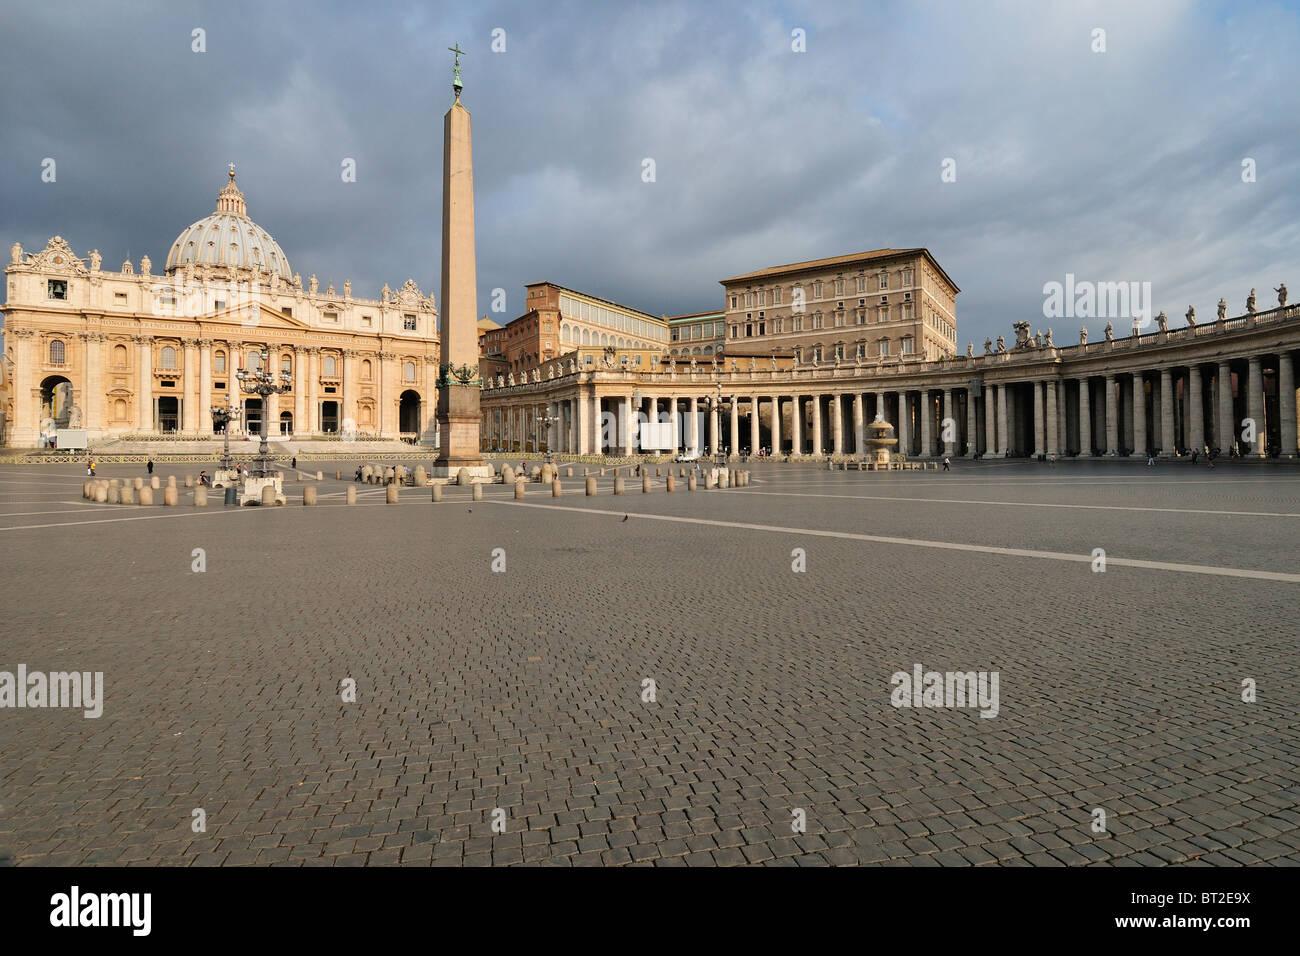 Rome. Italy. Basilica di San Pietro, Piazza San Pietro / St Peter's Square. - Stock Image